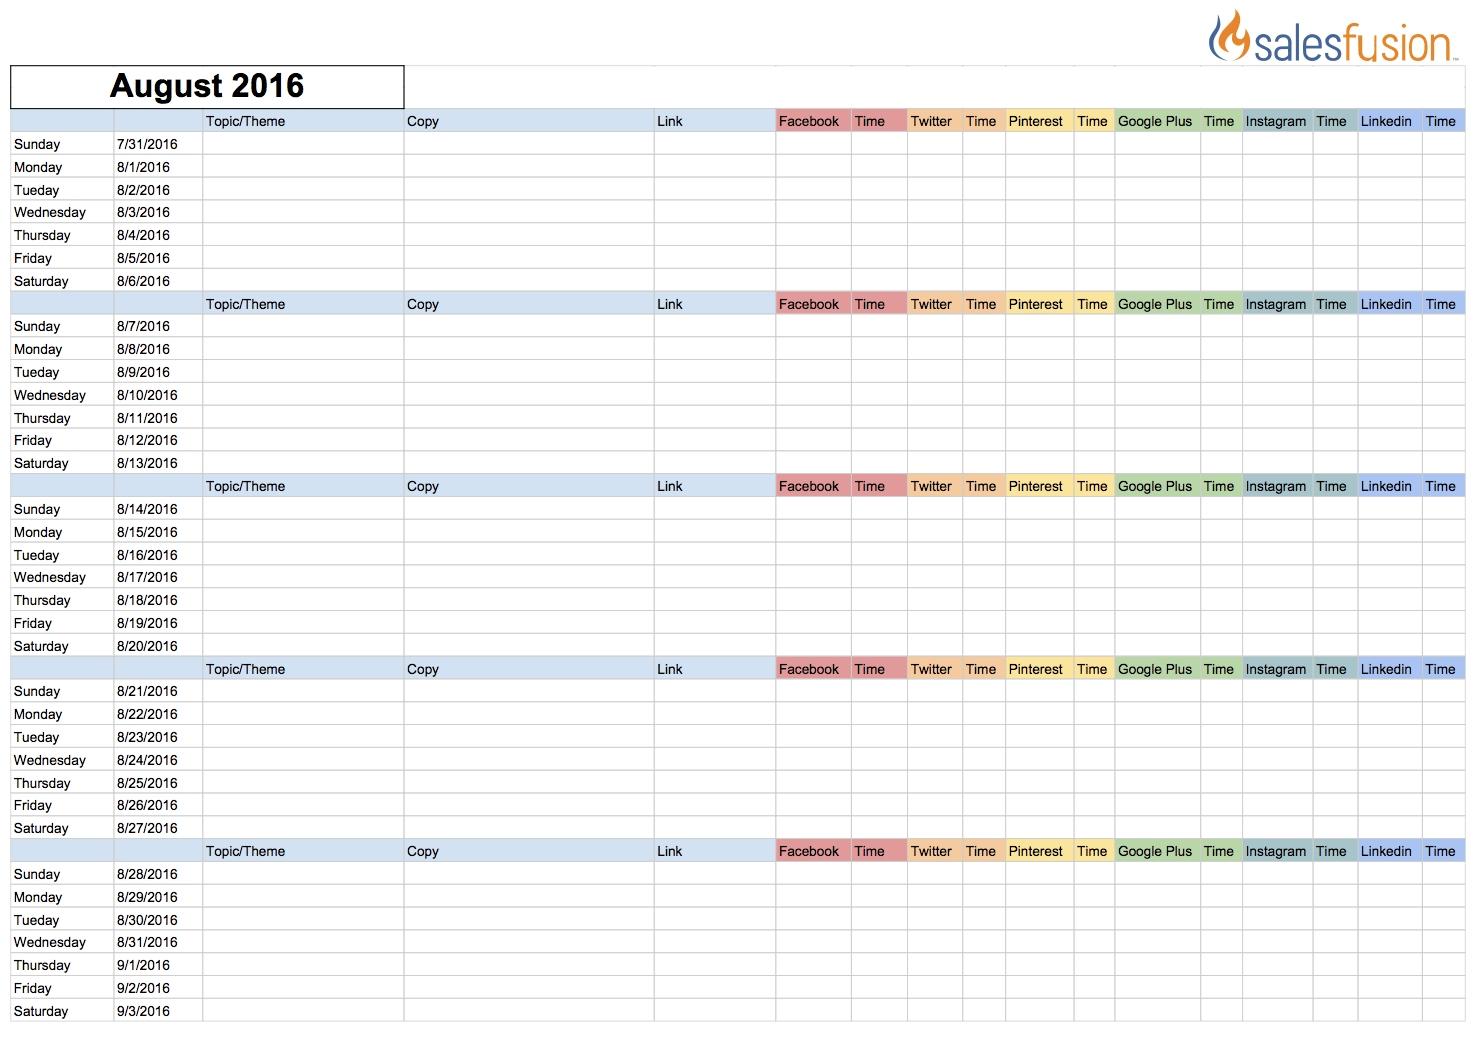 Social Media Content Calendar Template | Salesfusion-Social Media Posting Calendar Template